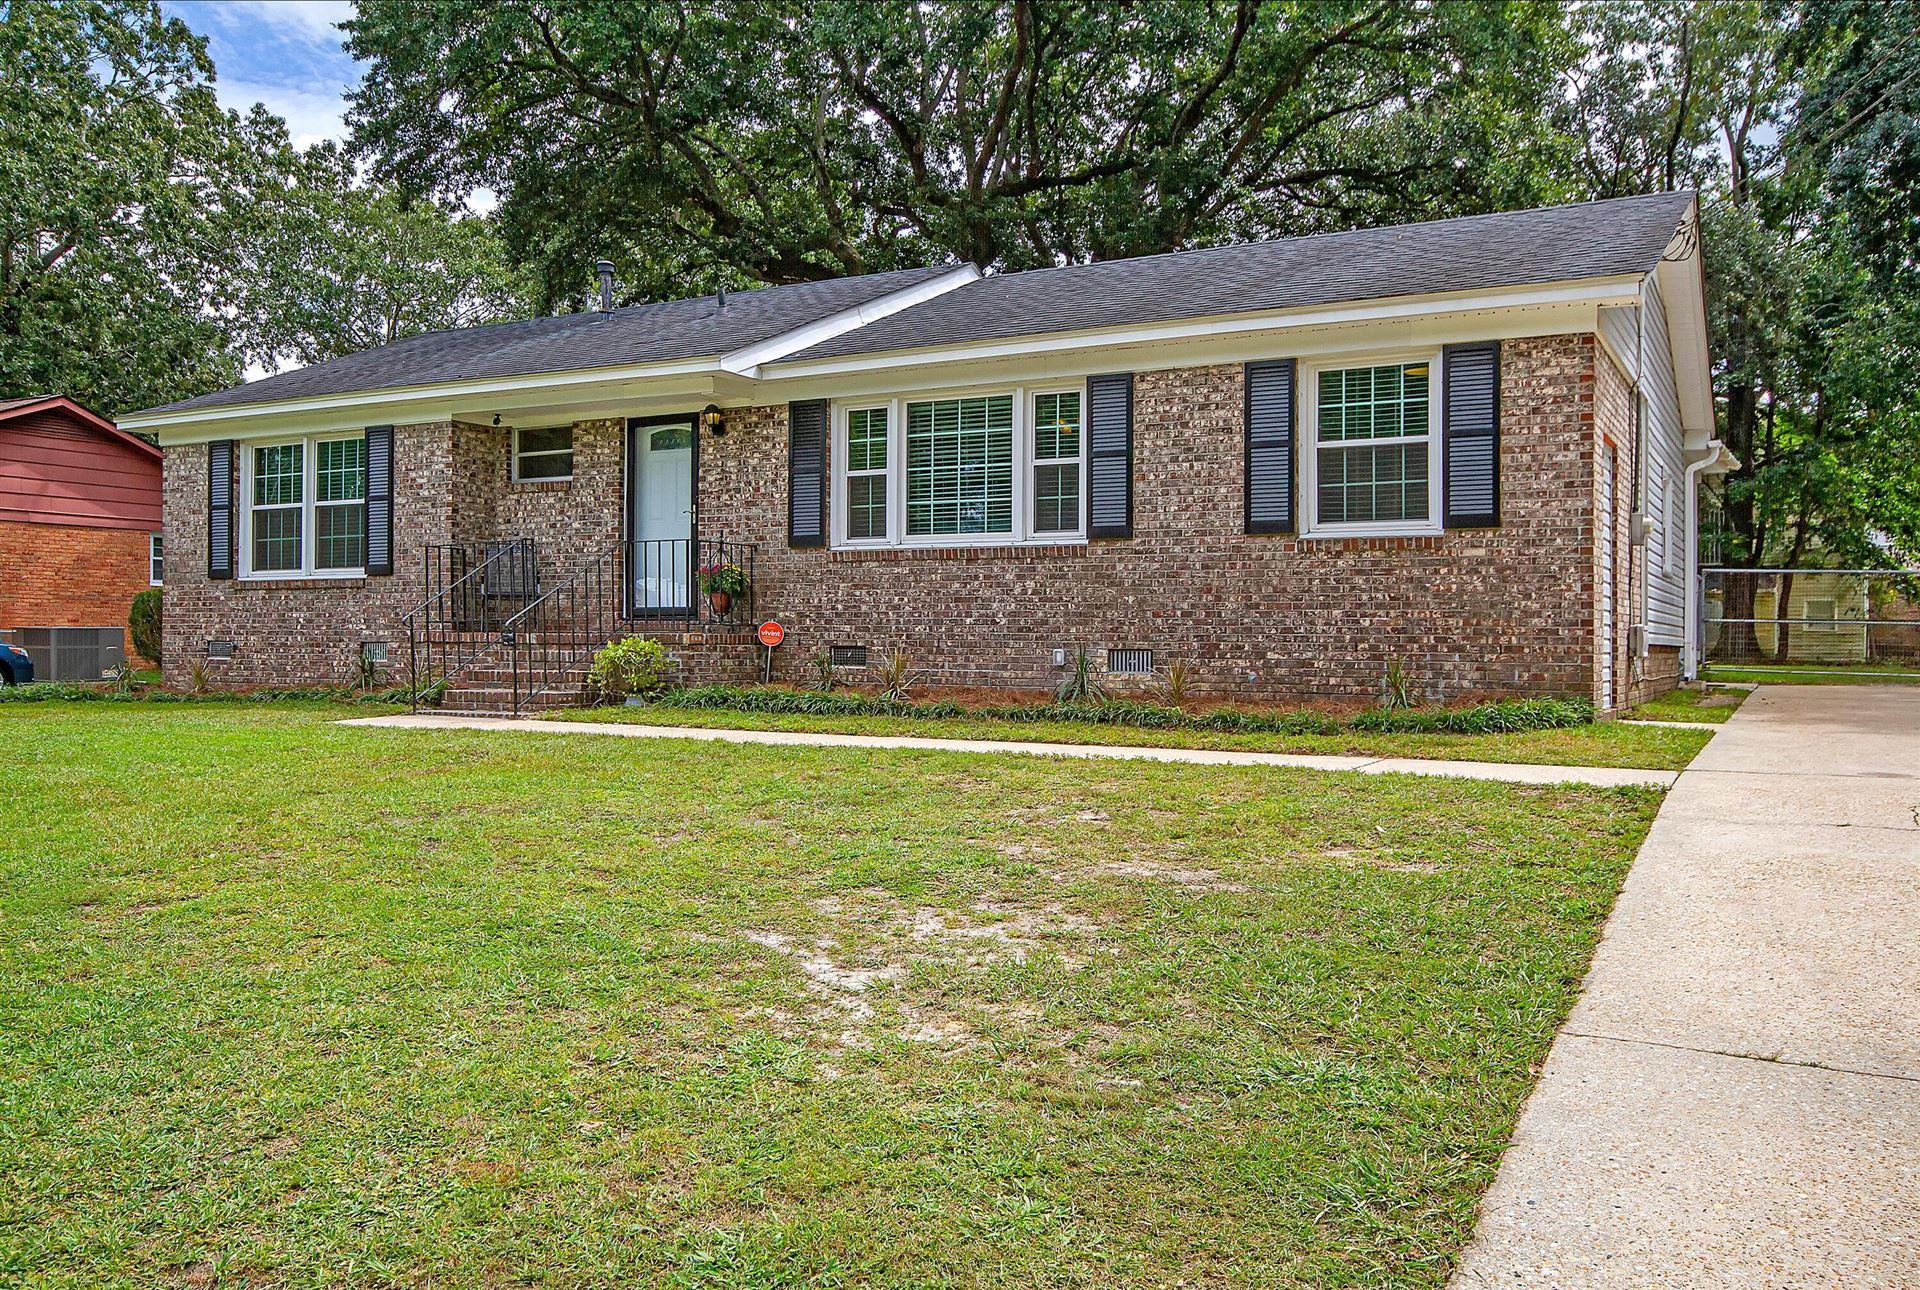 Photo of 3341 Stoneybrook Road, North Charleston, SC 29420 (MLS # 21025556)